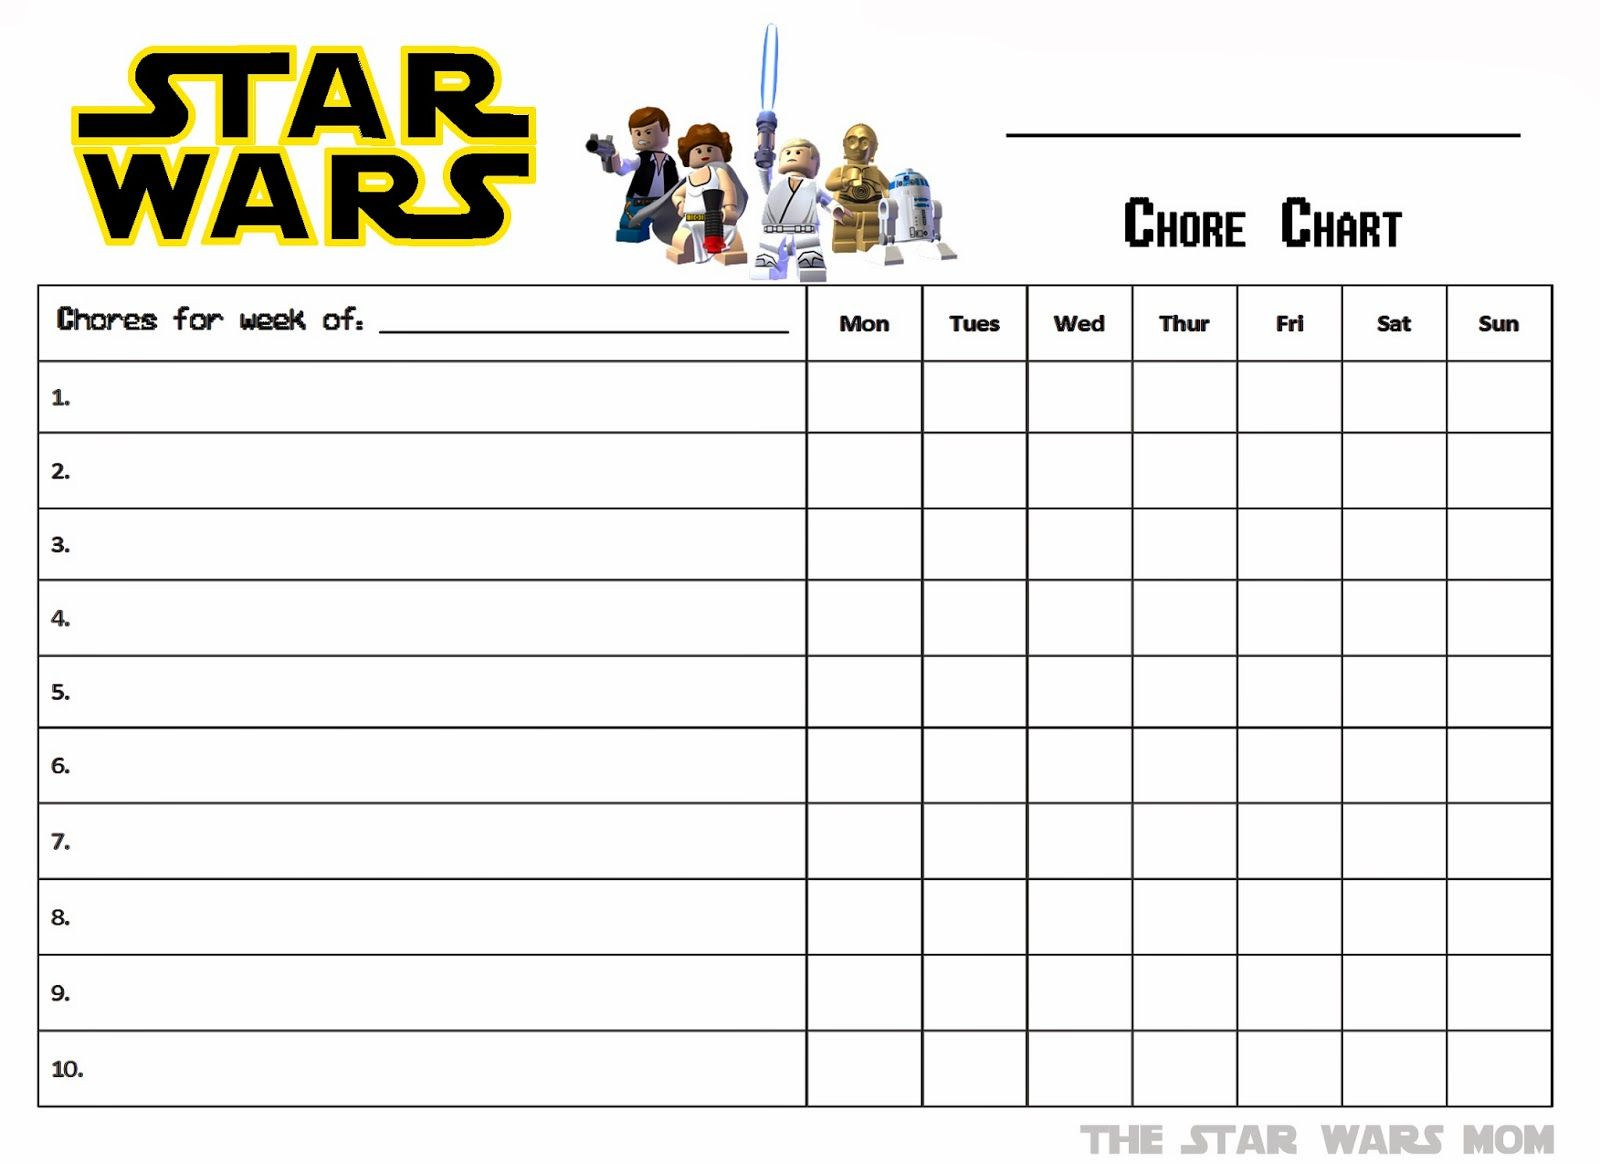 The Star Wars Mom Lego Star Wars Free Printable Chores